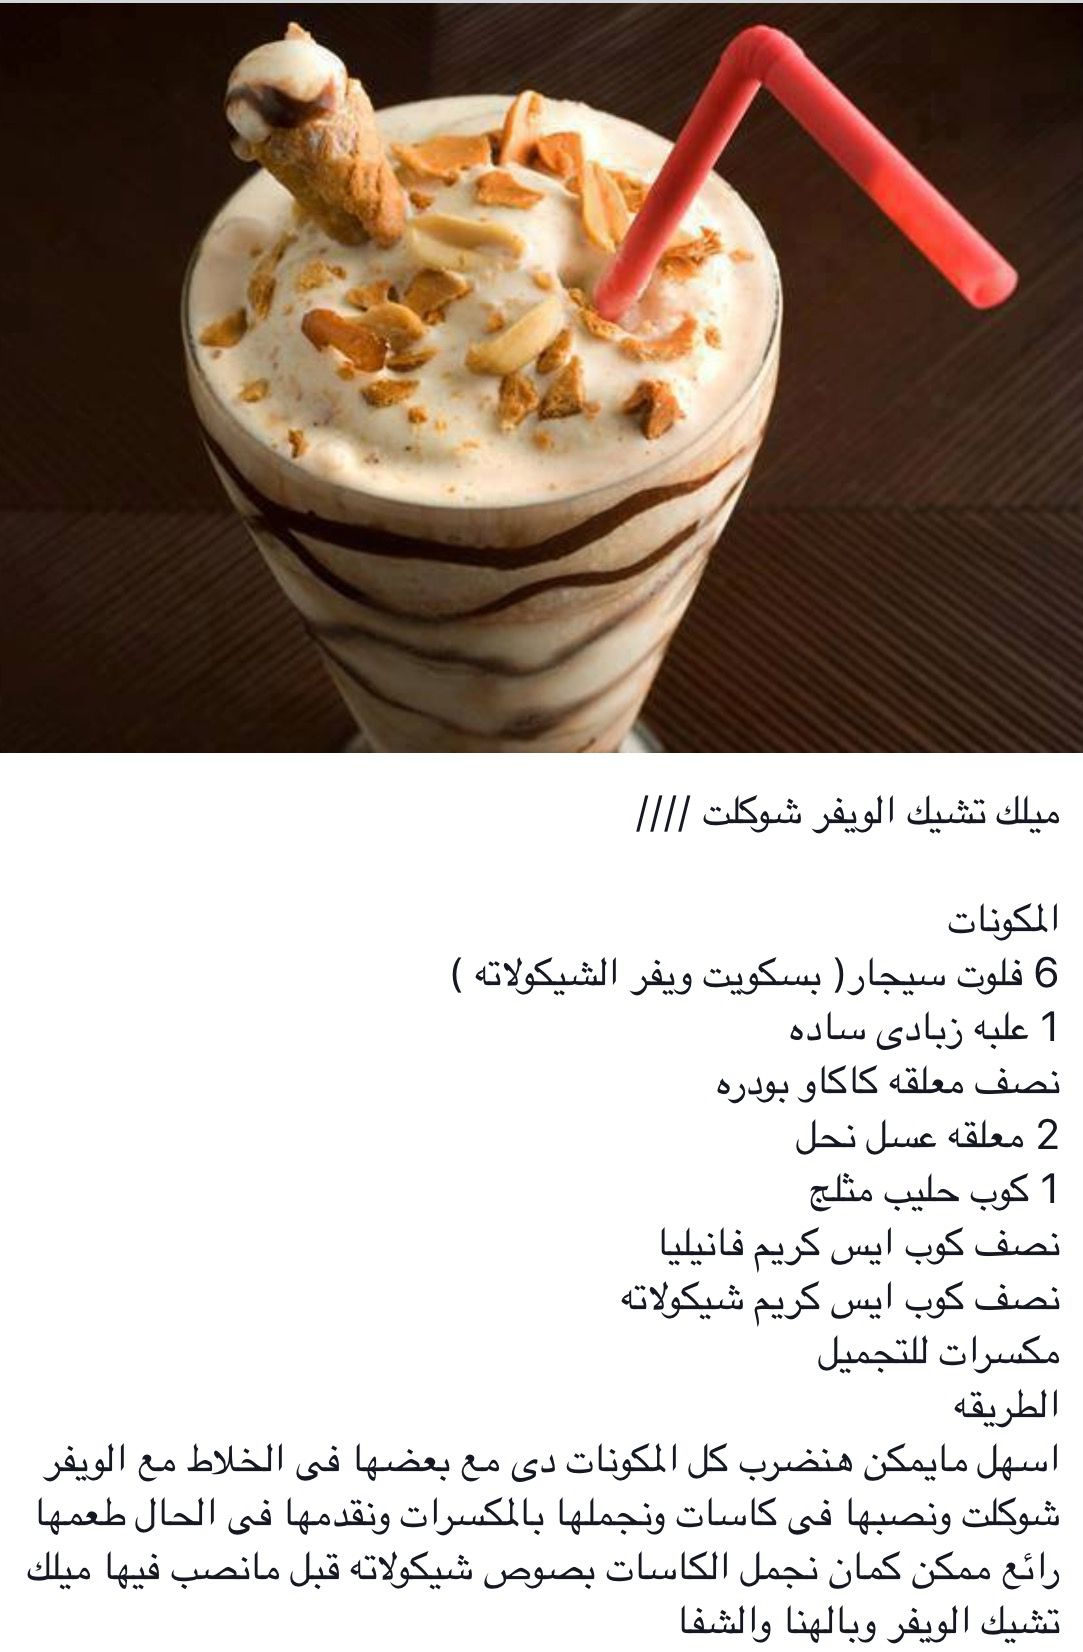 ميلك شيك الويفر شوكلت Coffee Drink Recipes Coffee Recipes Food Recipies